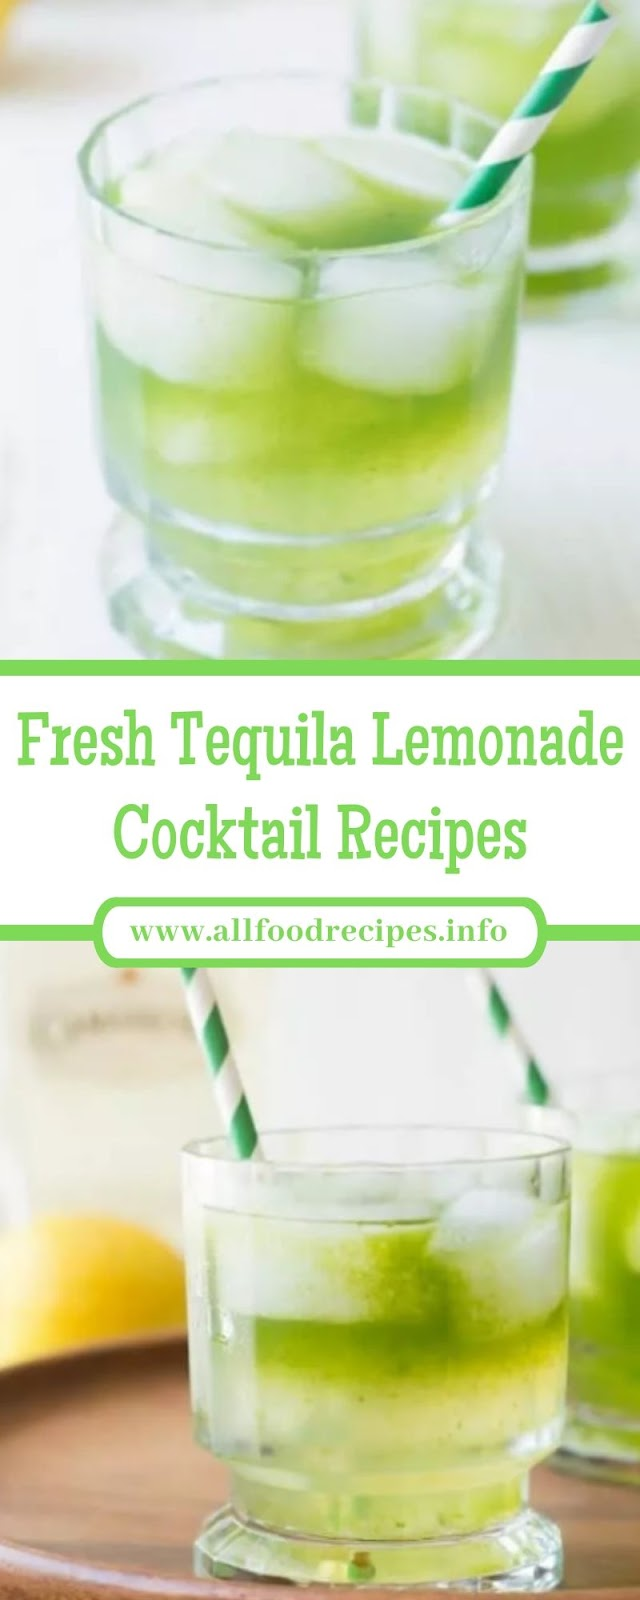 Fresh Tequila Lemonade Cocktail Recipes